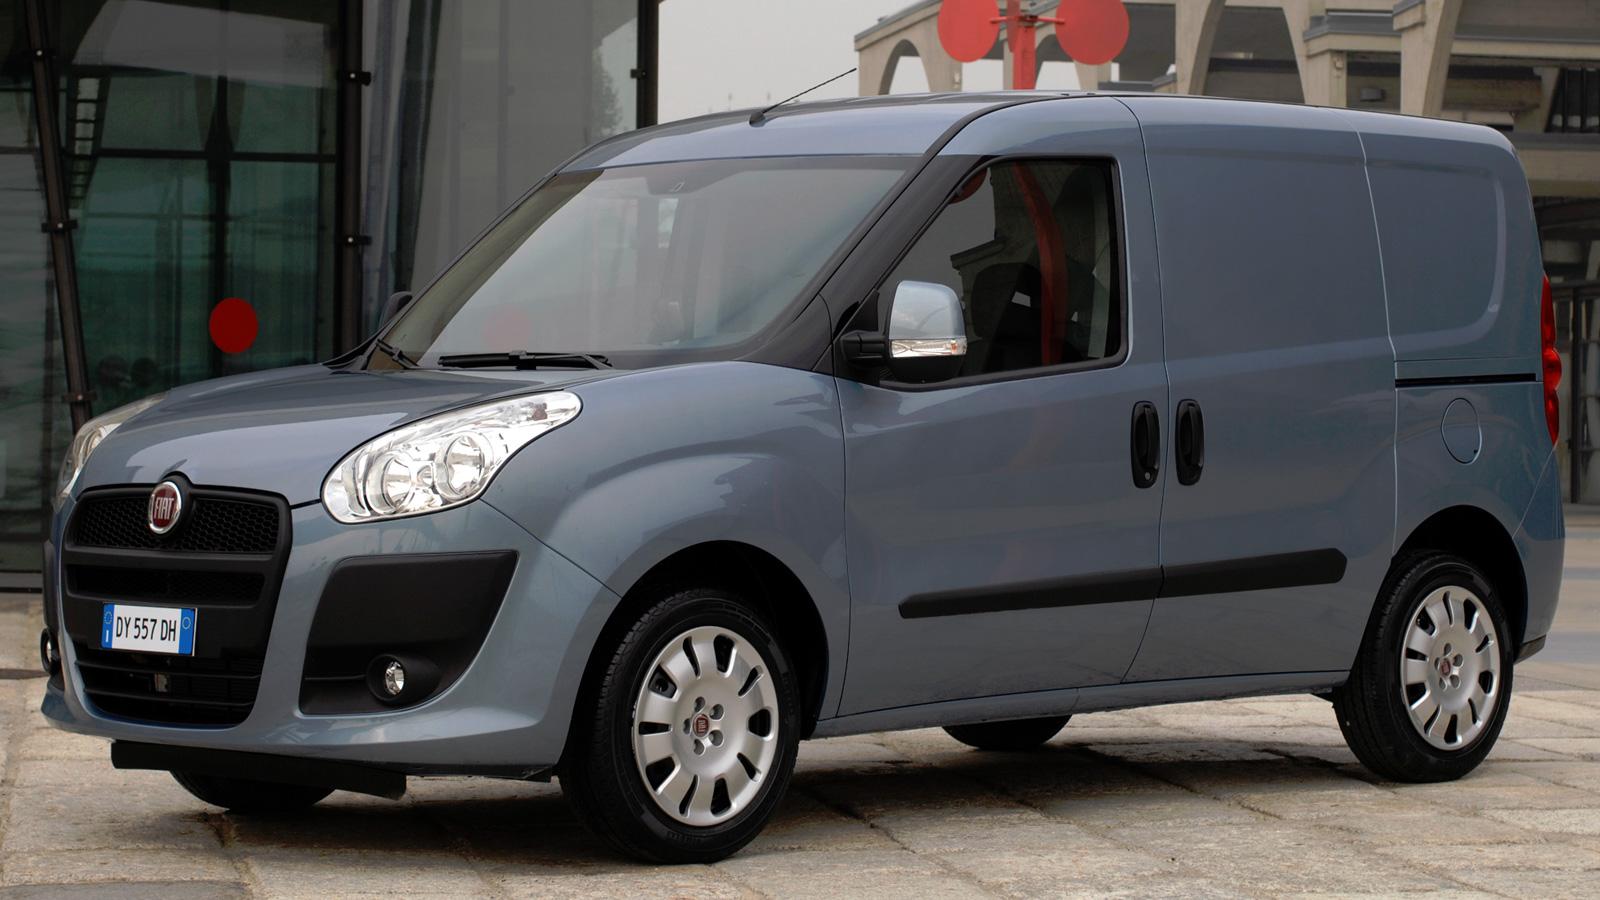 технические характеристики пассажирского фургона fiat l2h2m1f